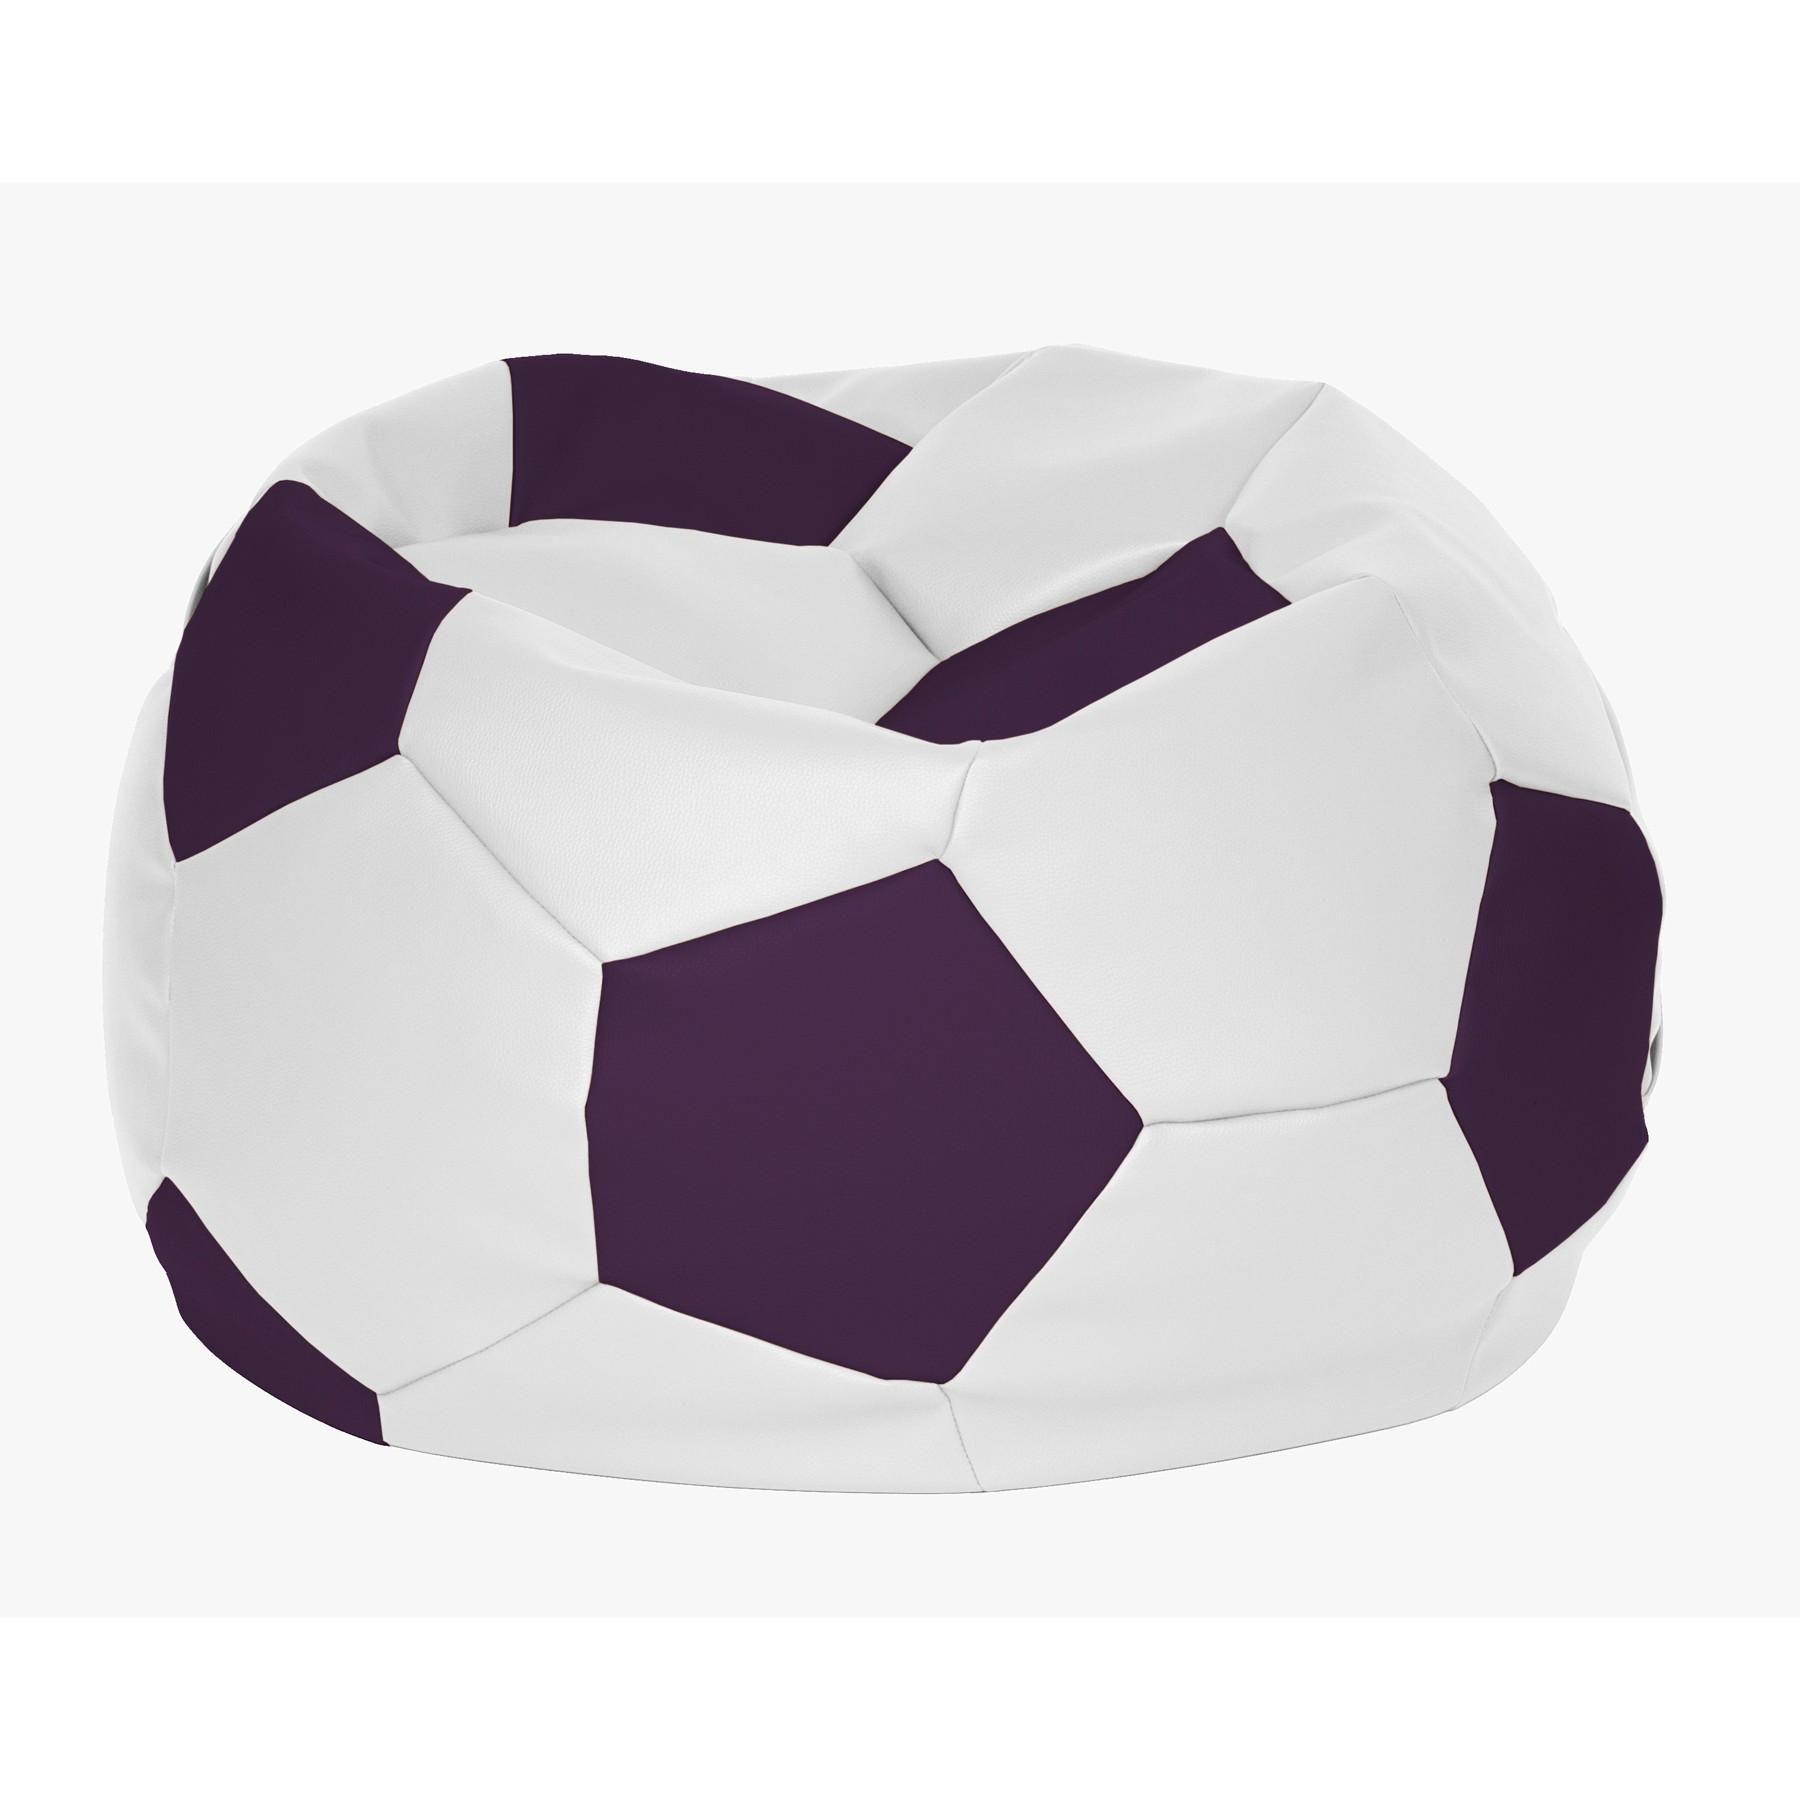 Puff de dise o original tipo pelota de futbol - Puffs de diseno ...